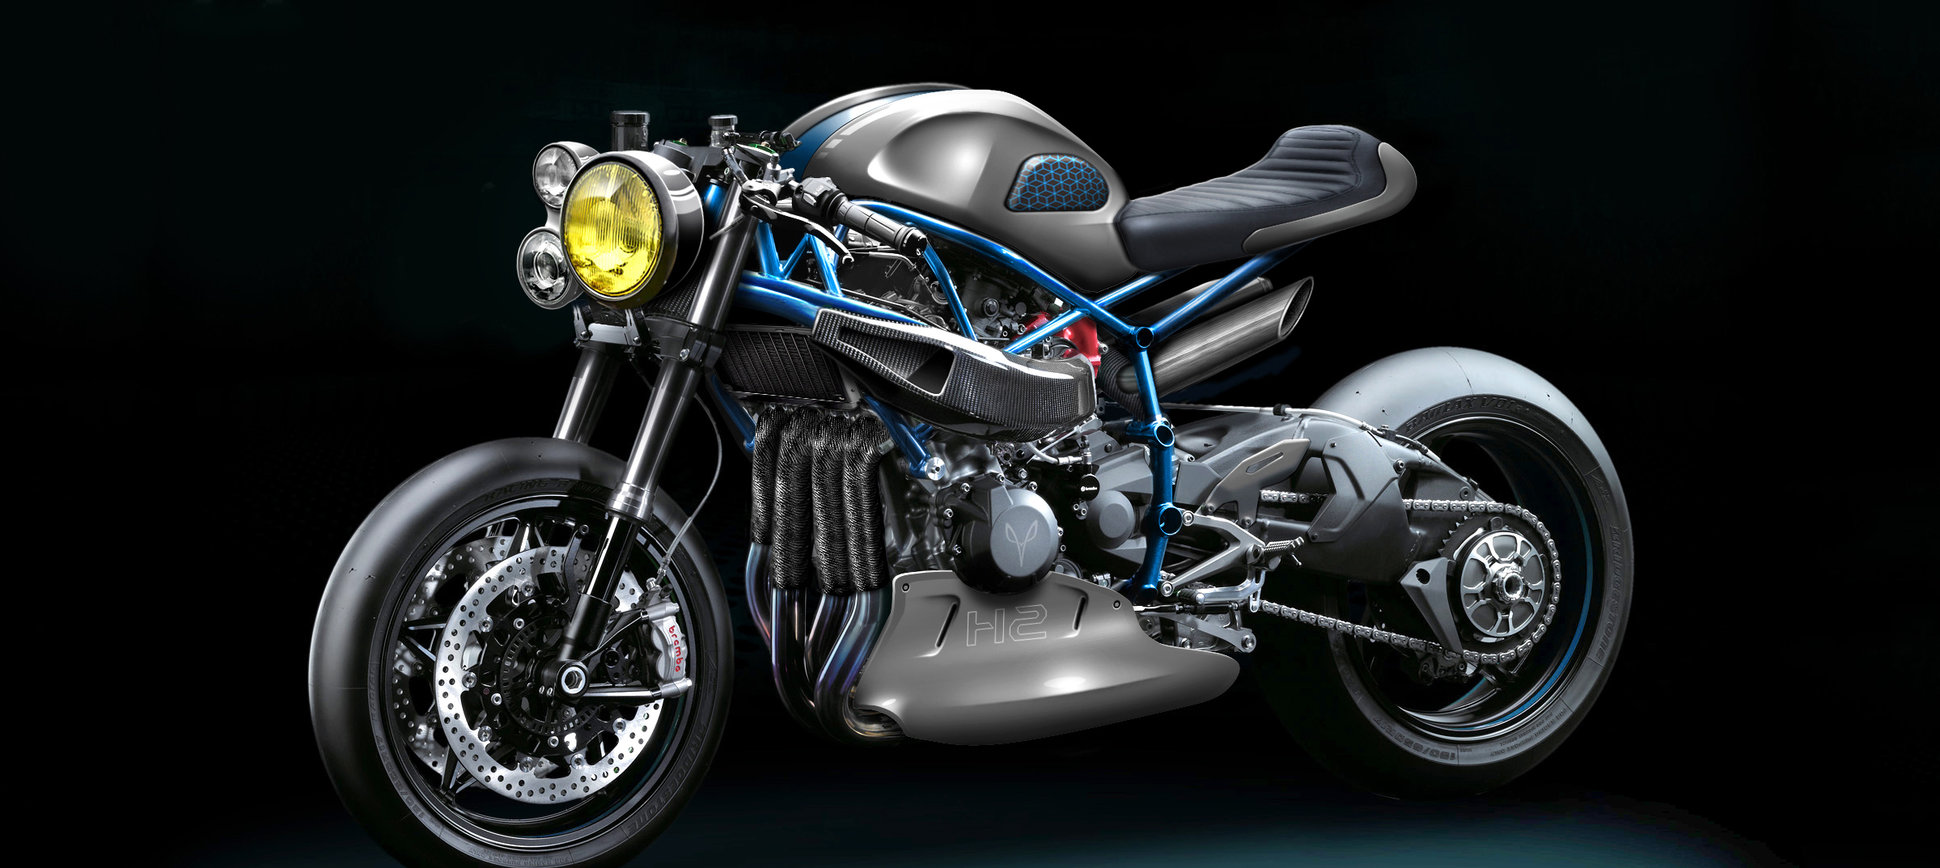 Kawasaki H2R by Gannet Design